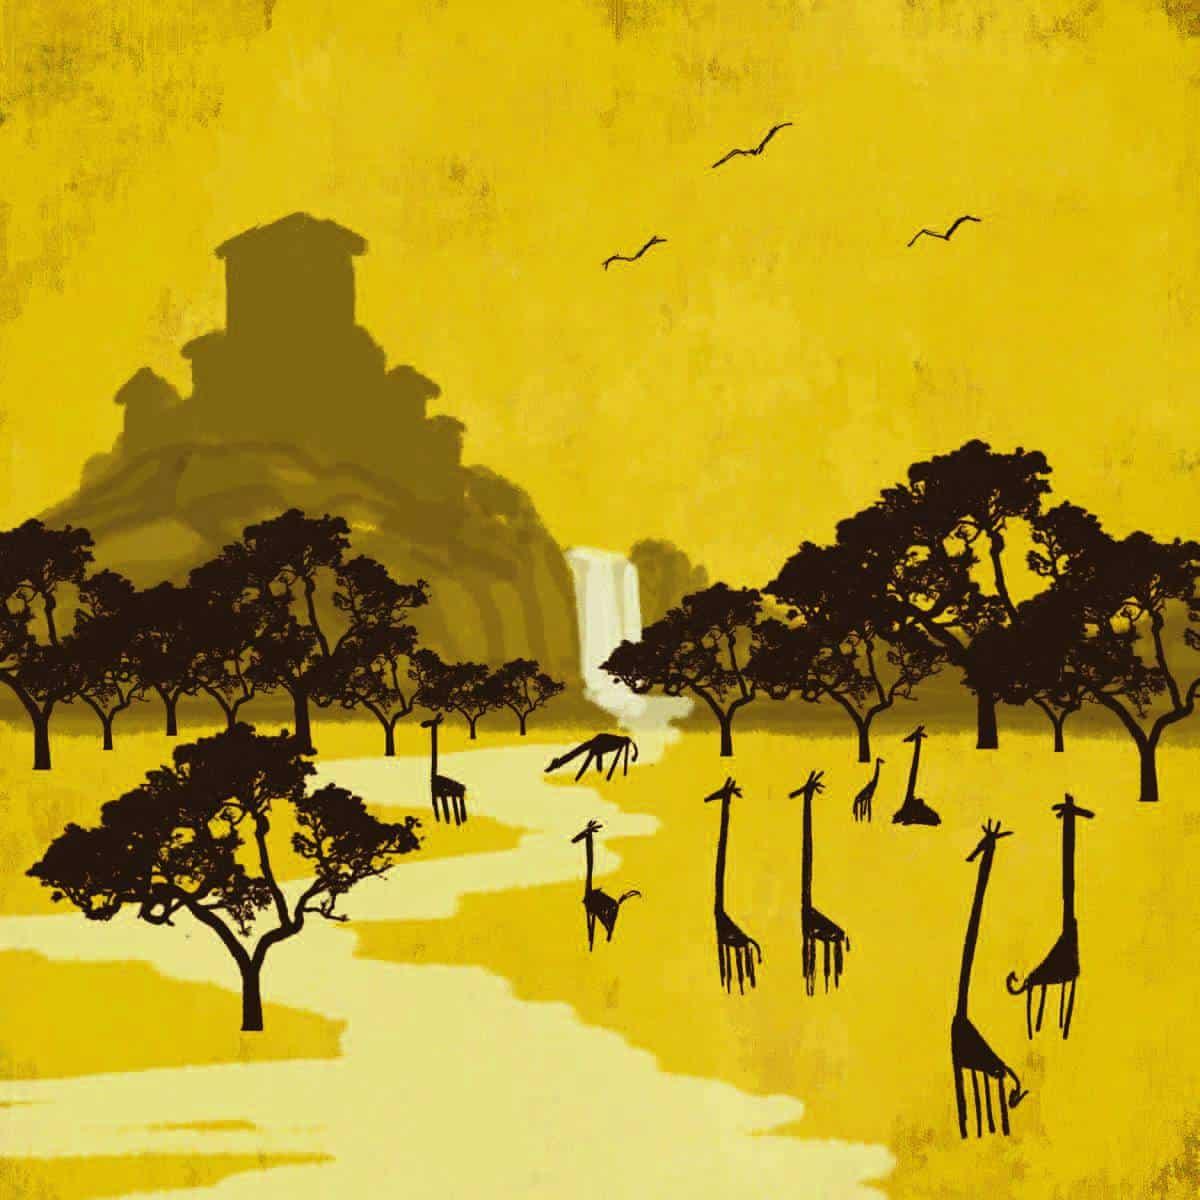 Gordon-the-Giraffe-image-02